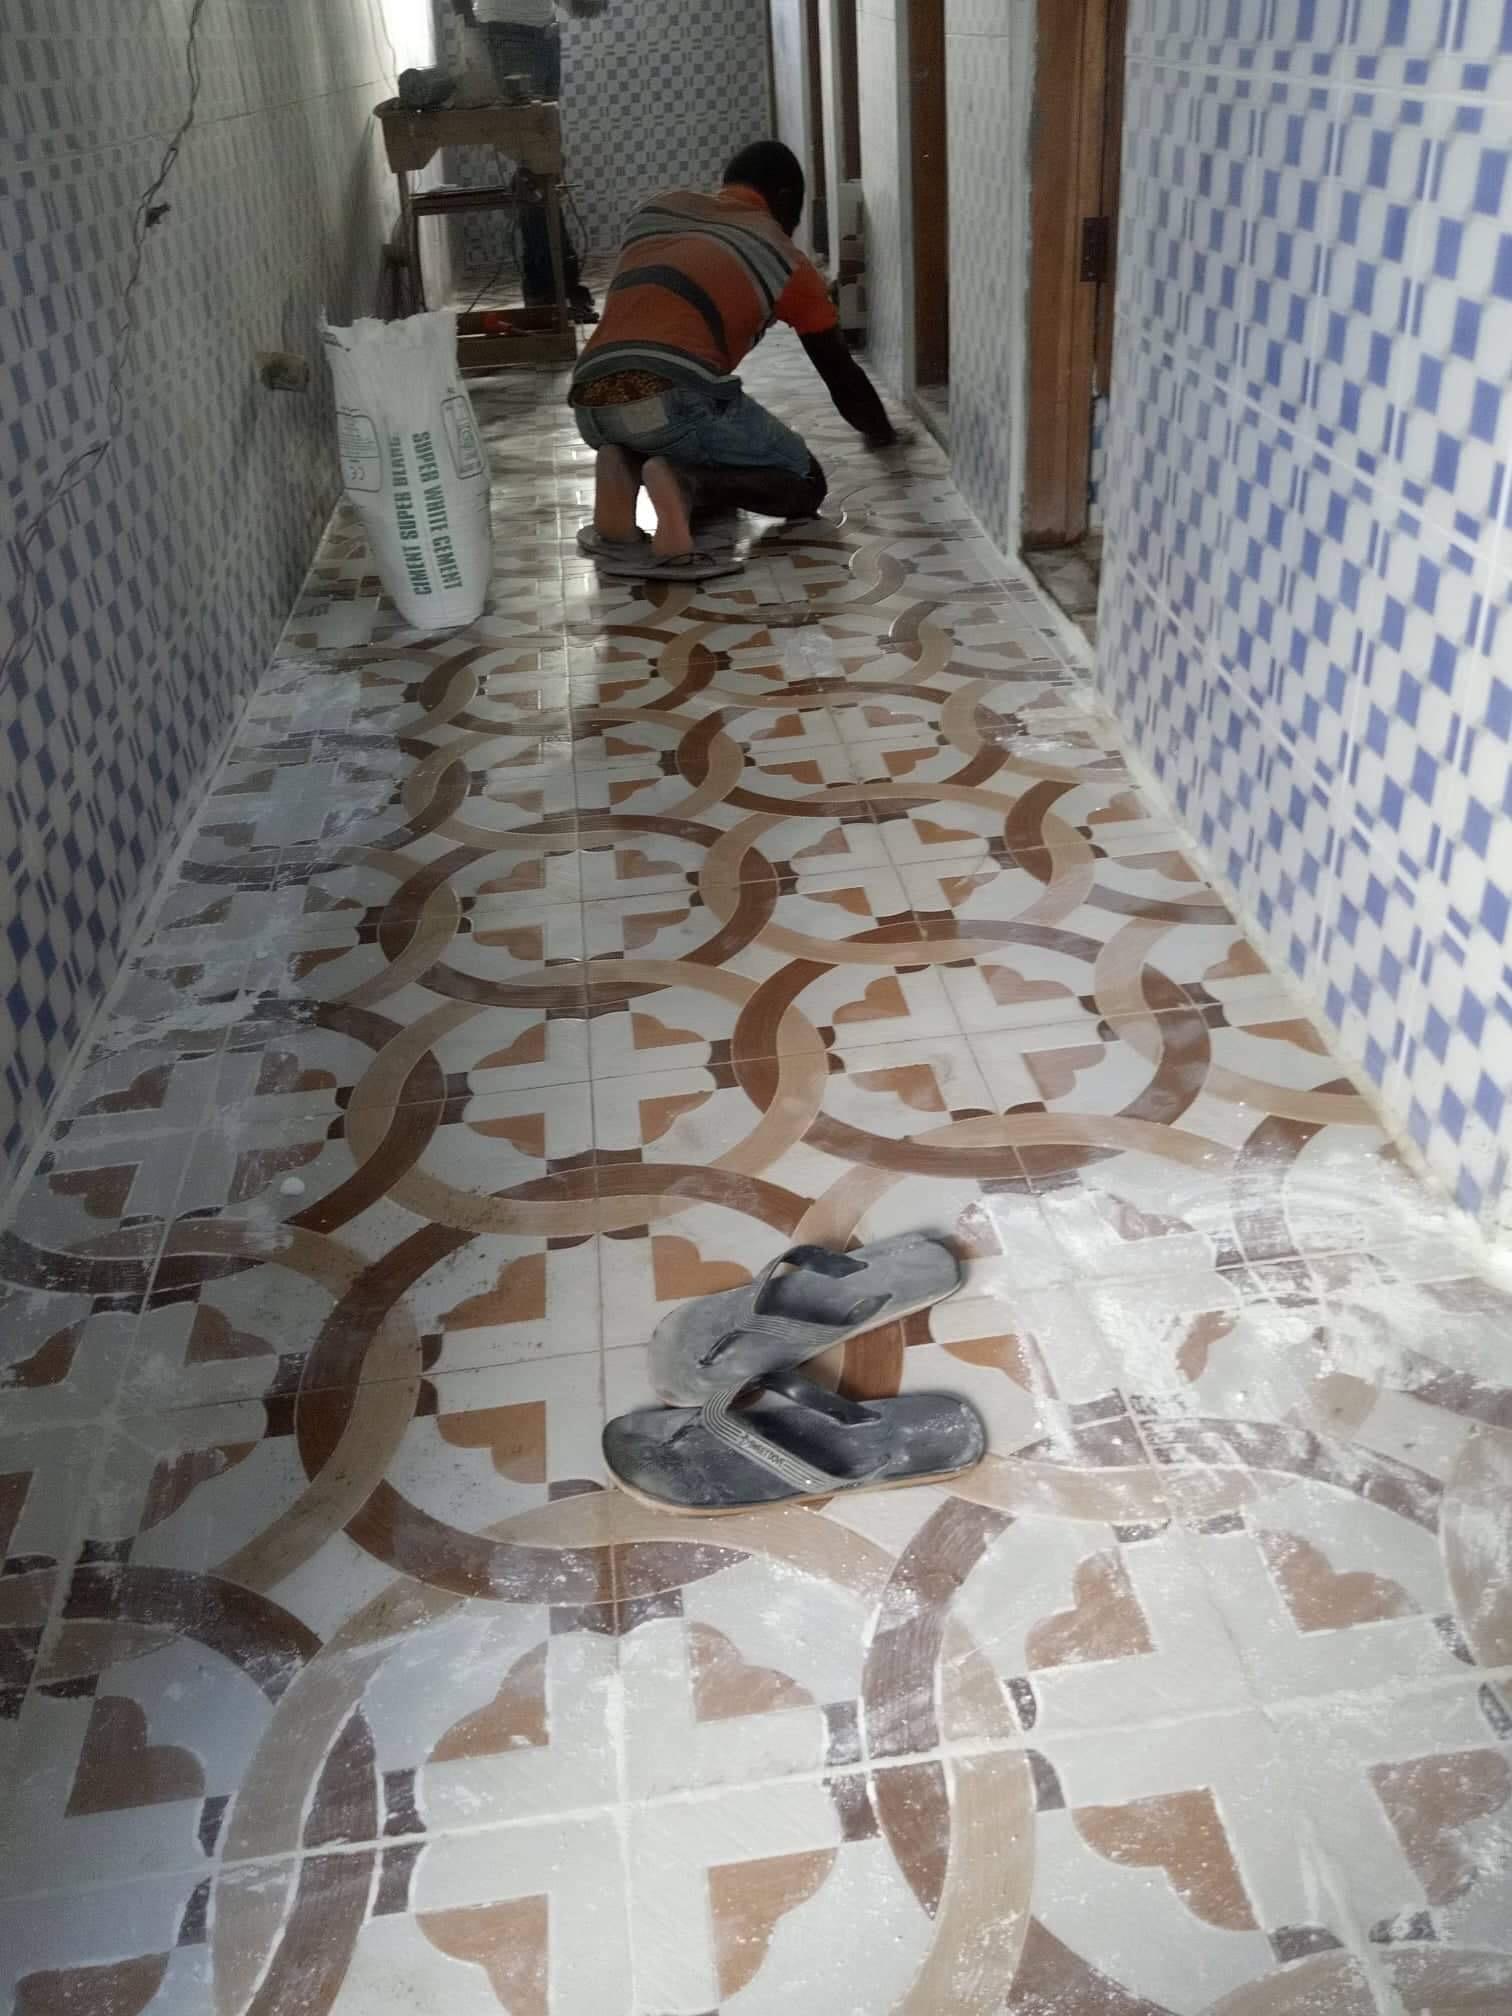 Laying of Tiles 3.jpeg